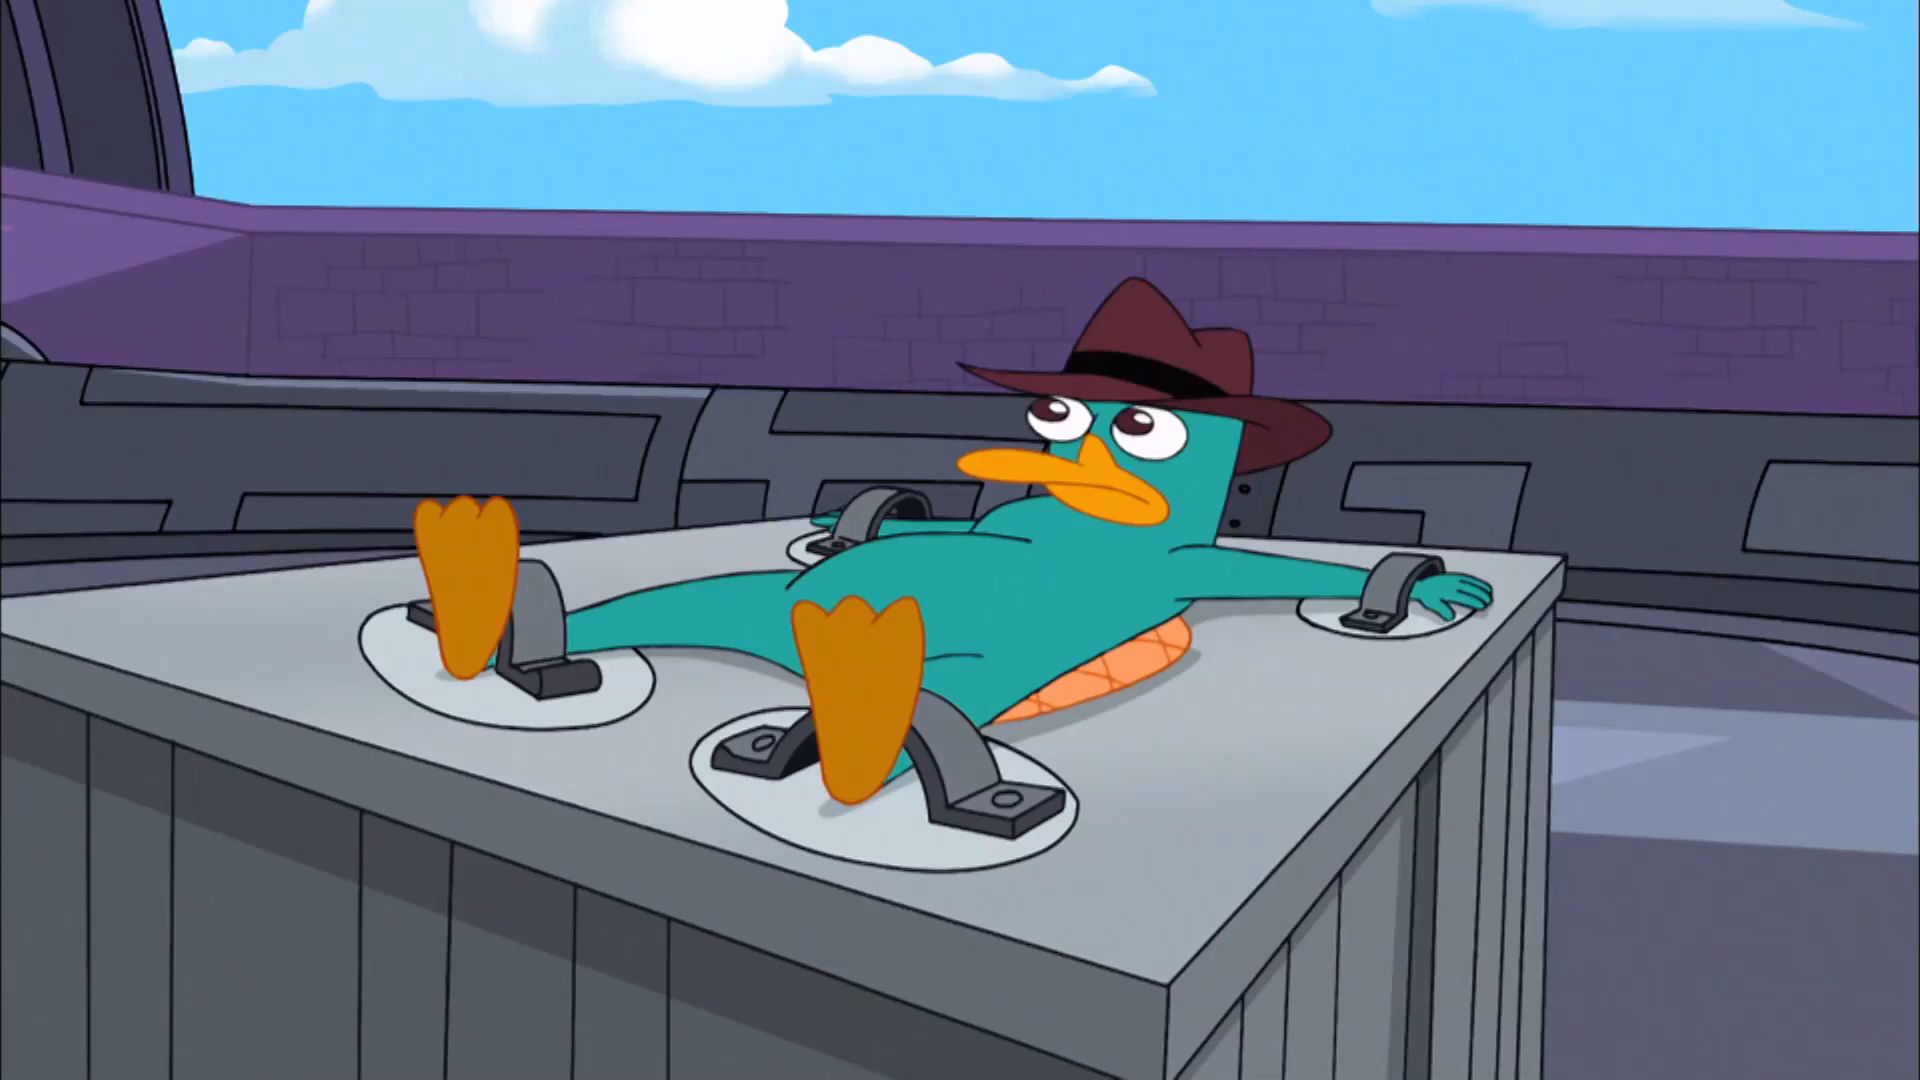 Phineas og Ferb - Dr Doofenshmirtz fanger Agent P